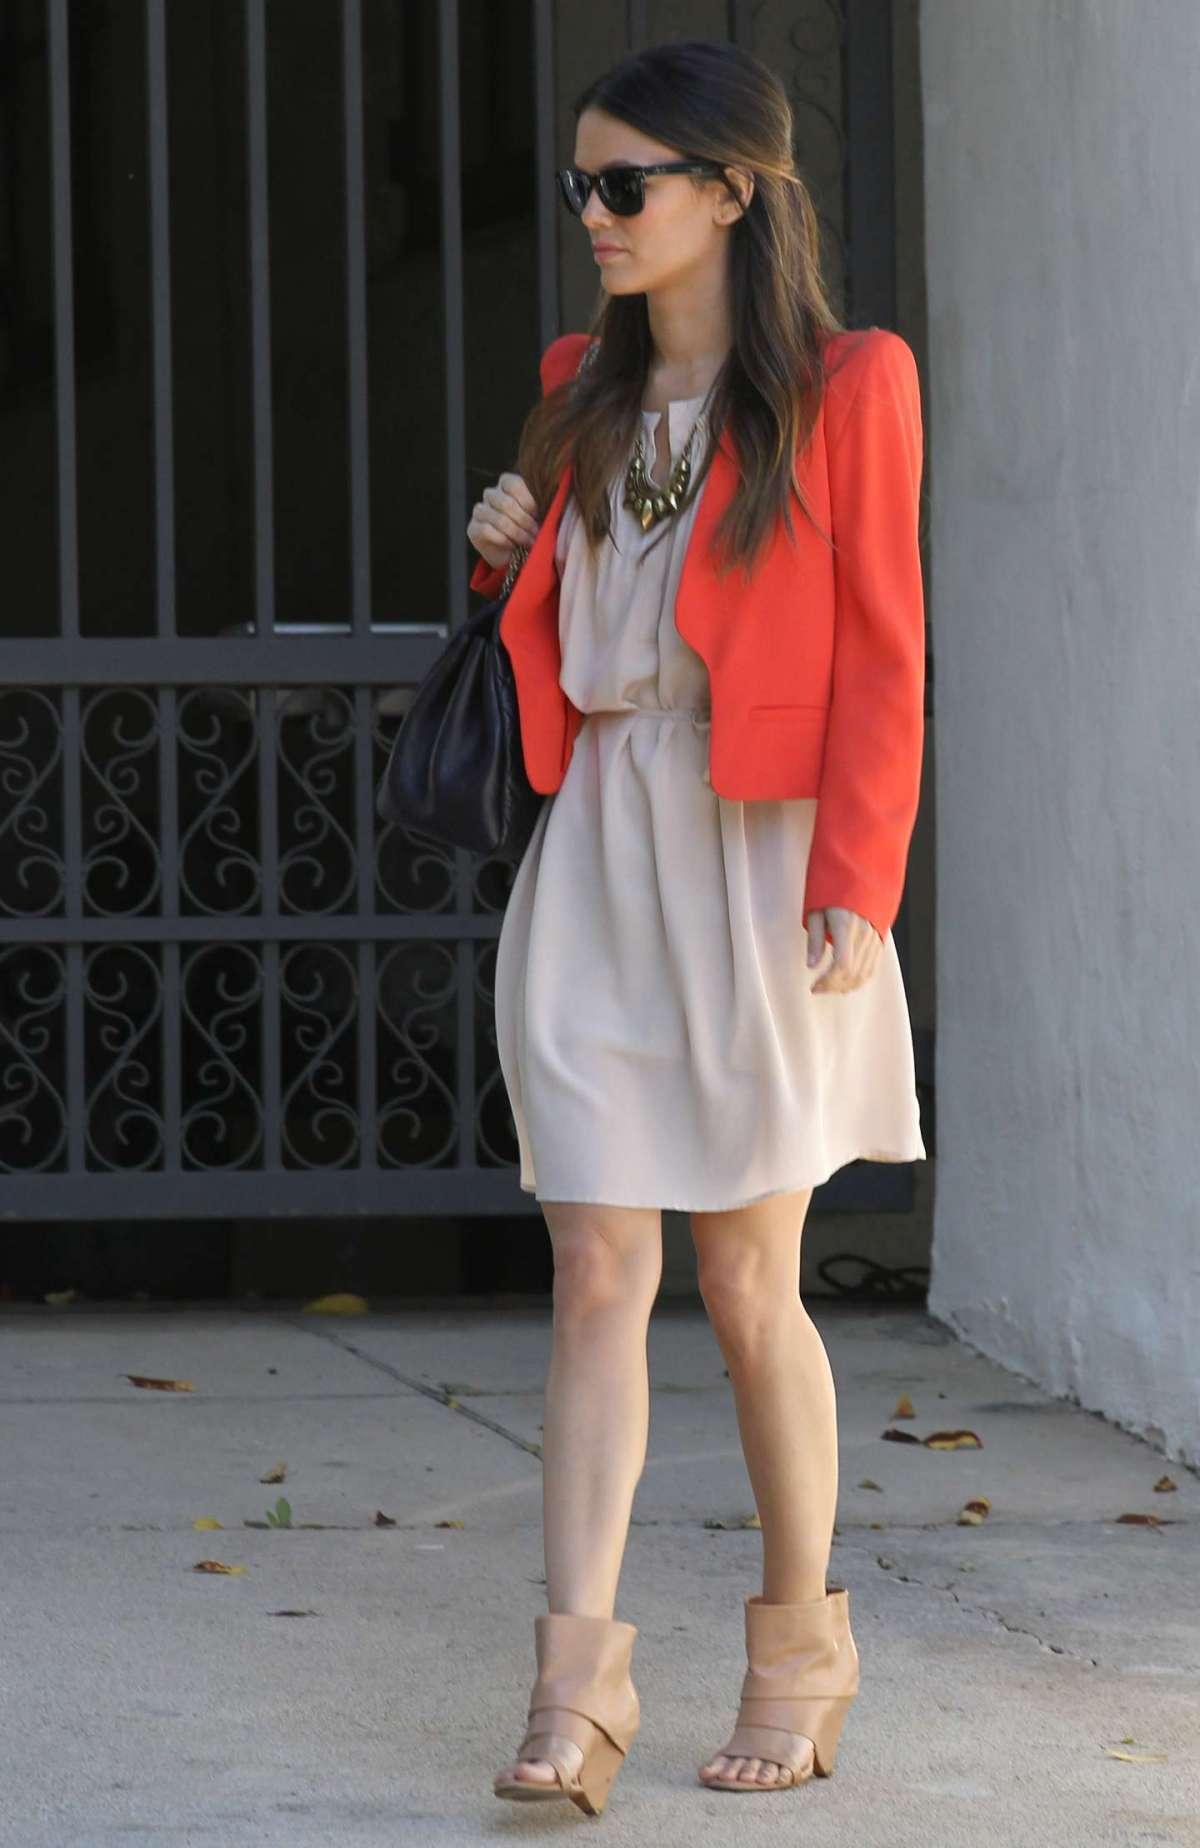 Minidress cipria e giacca arancione